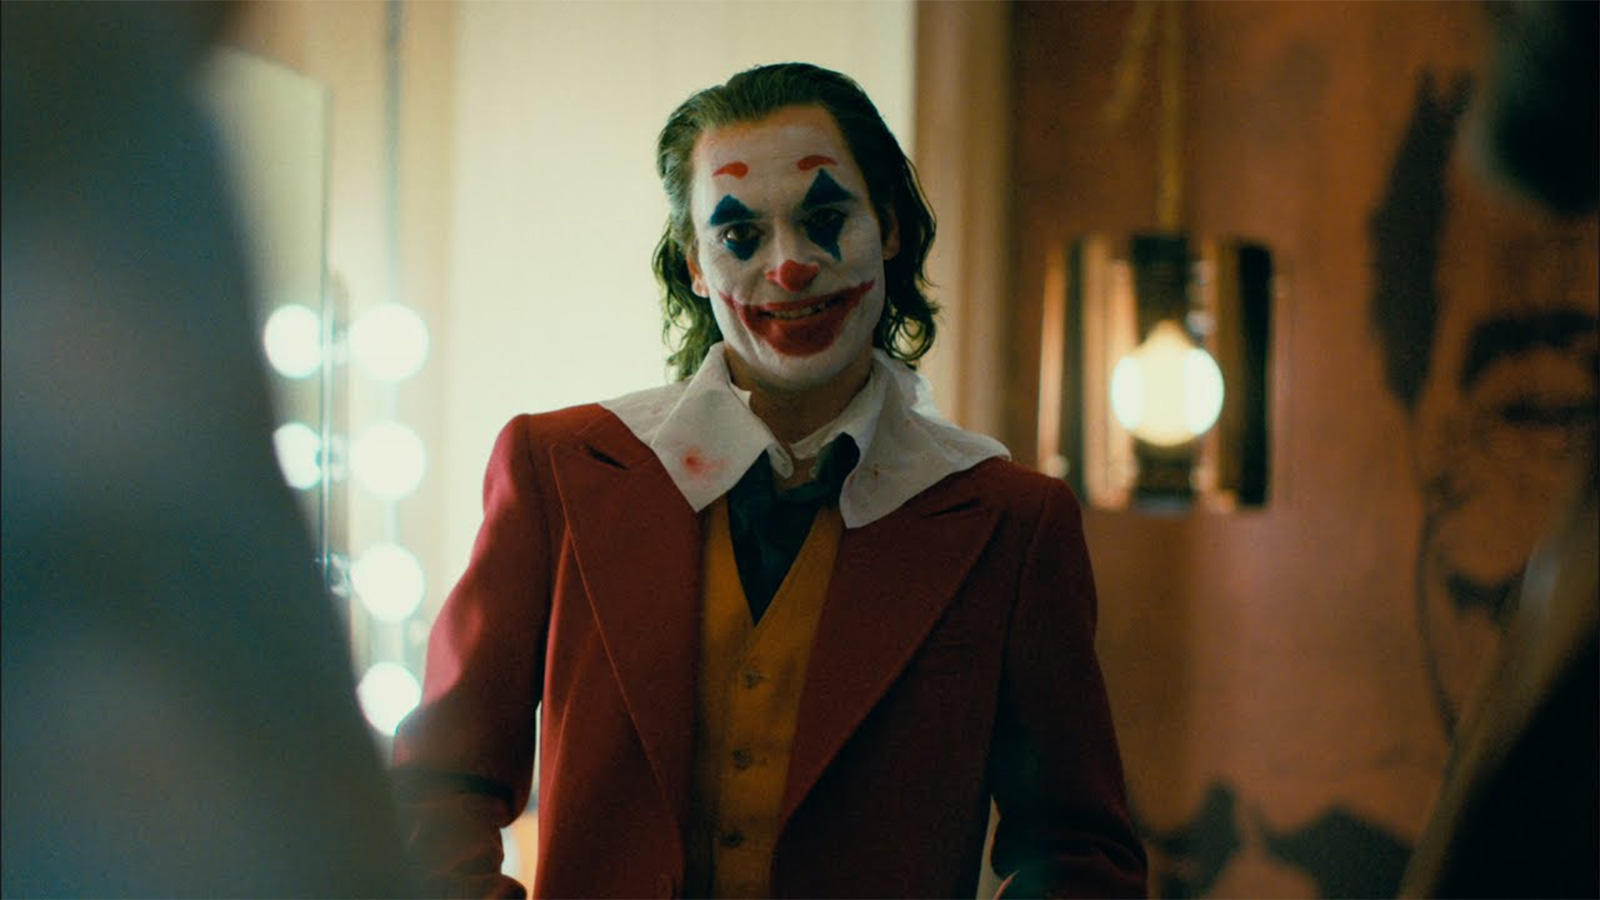 Joker - Official Trailer